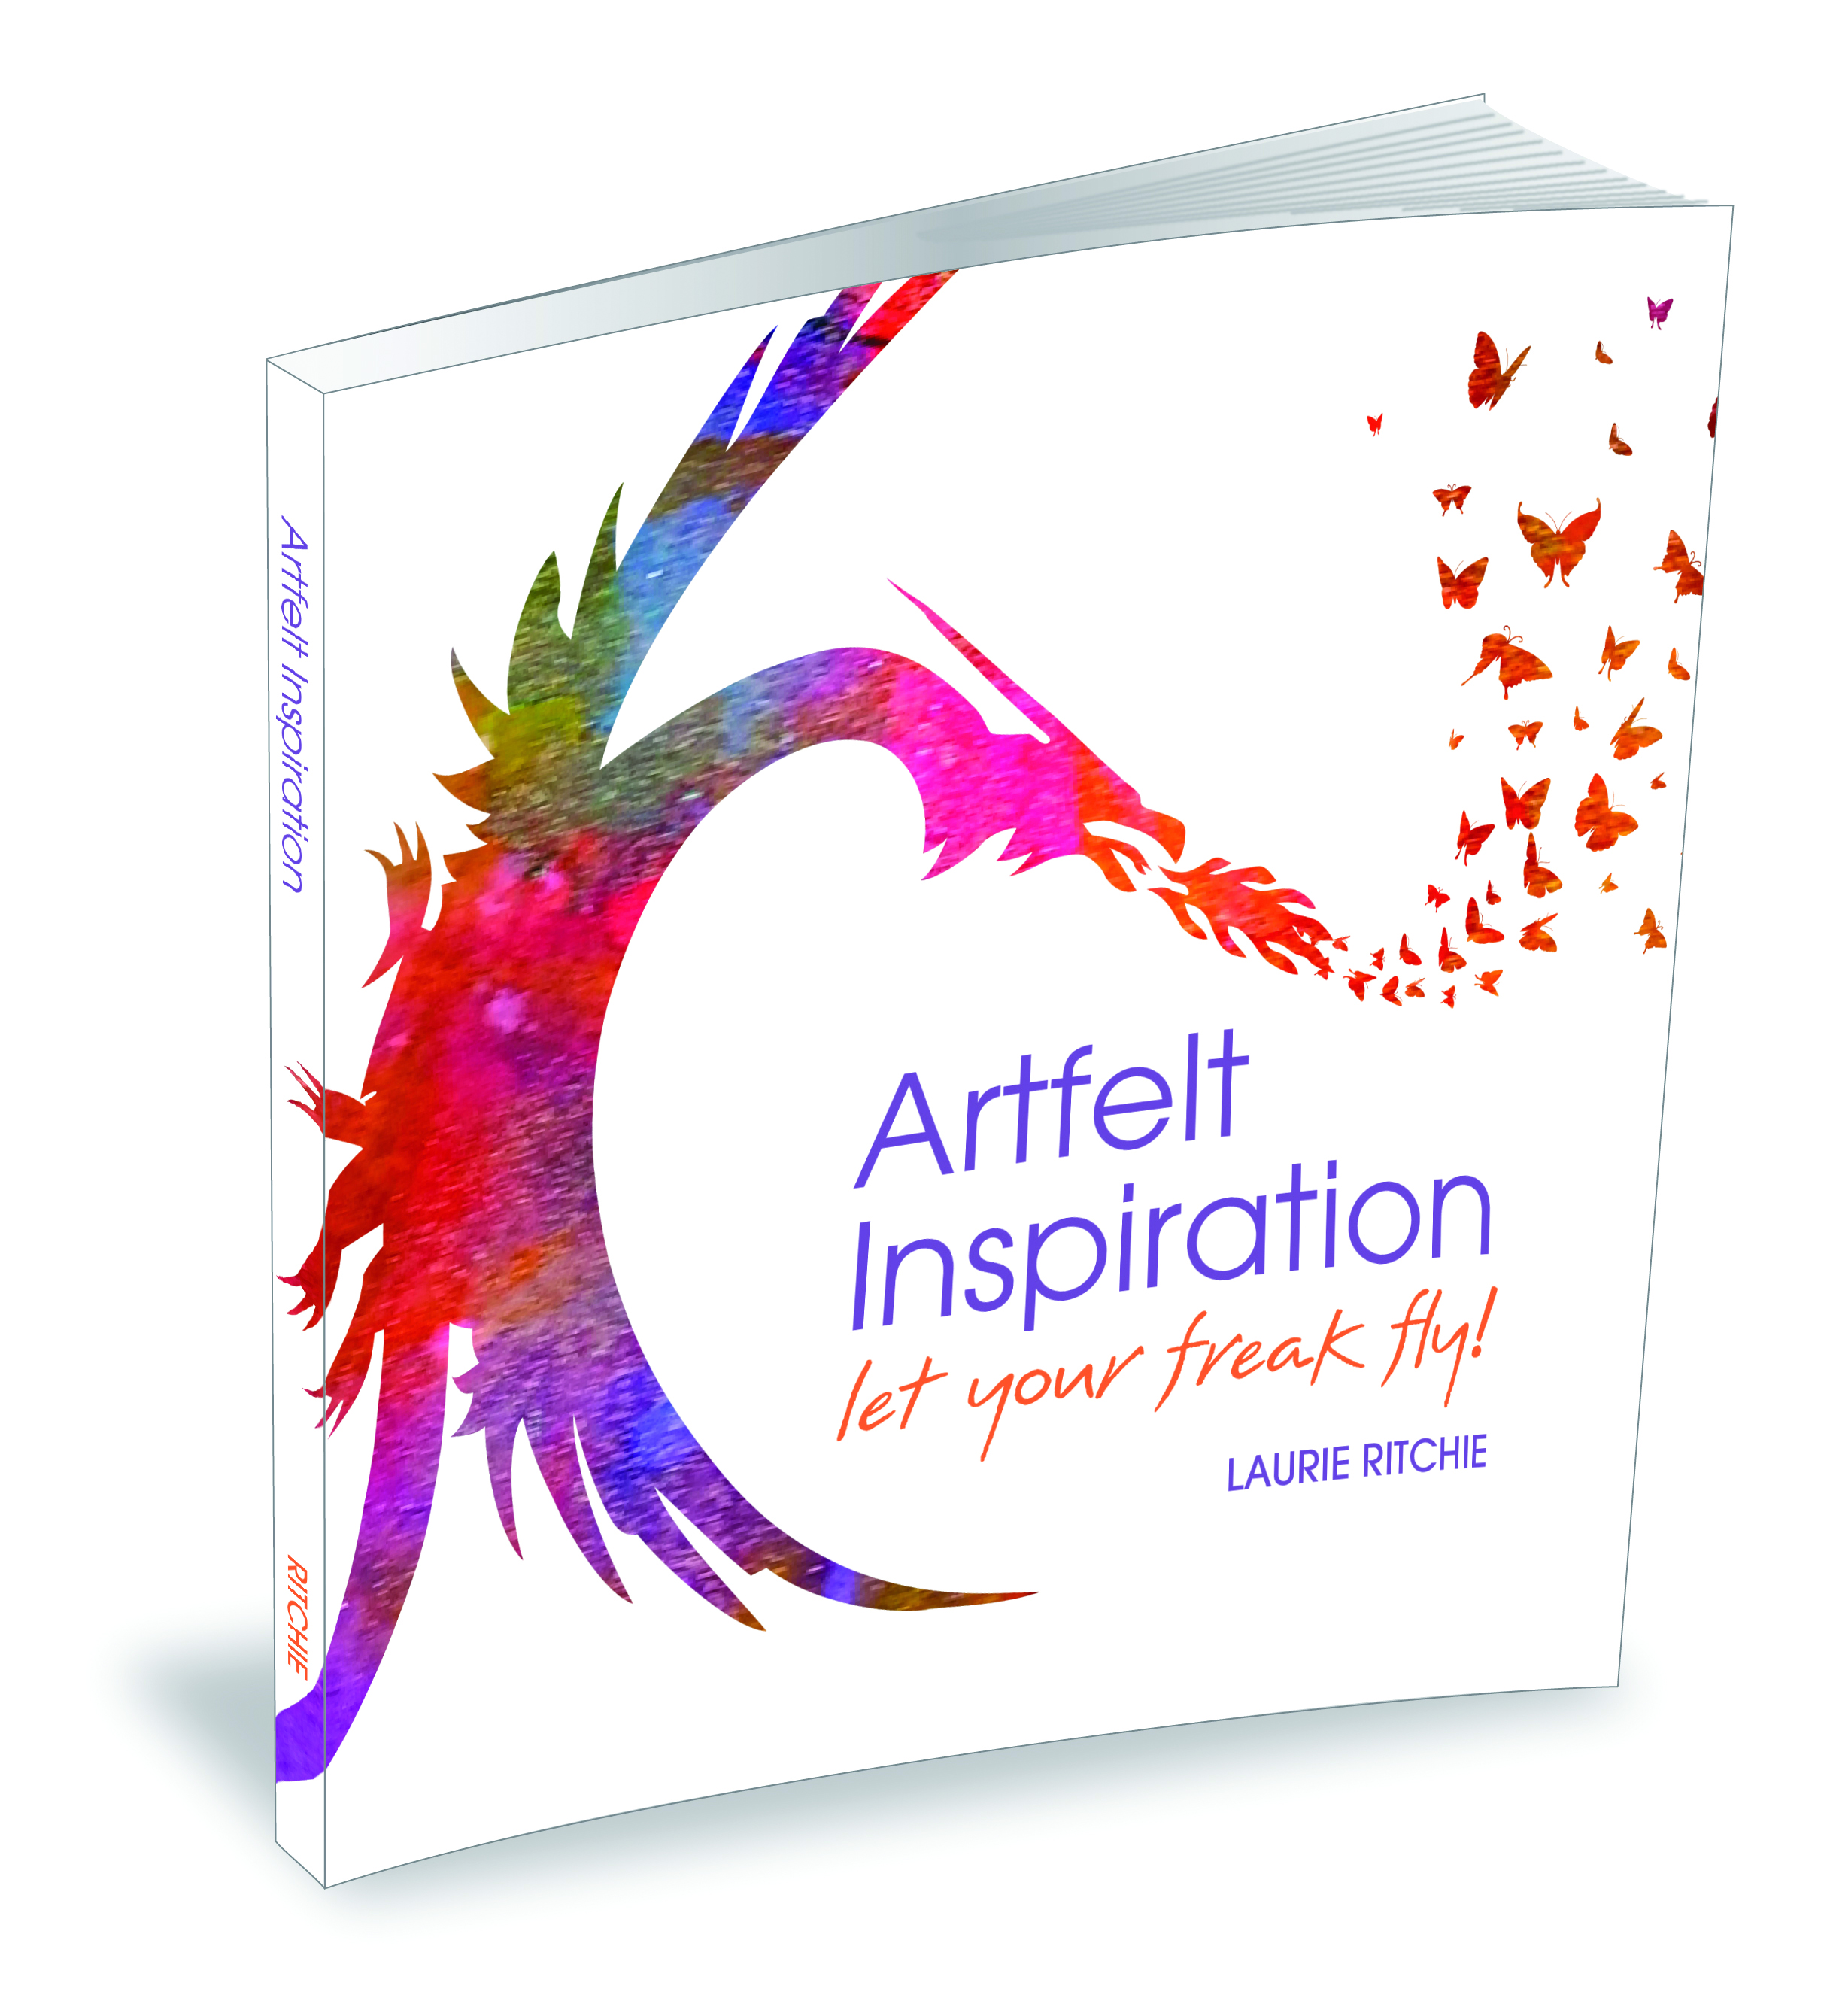 ARTFELT INSPIRATION - BOOK